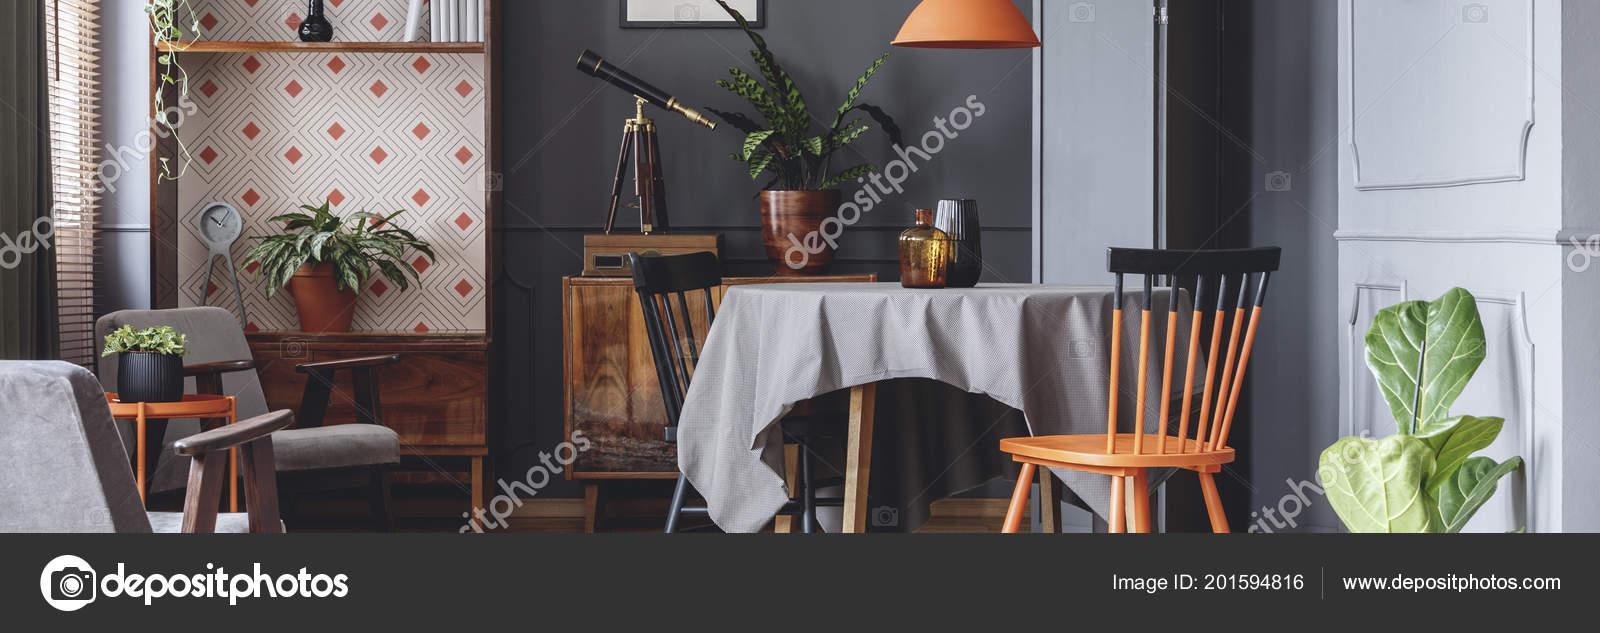 Interior Comedor Gris Oscuro Con Armarios Retros Plantas Frescas ...